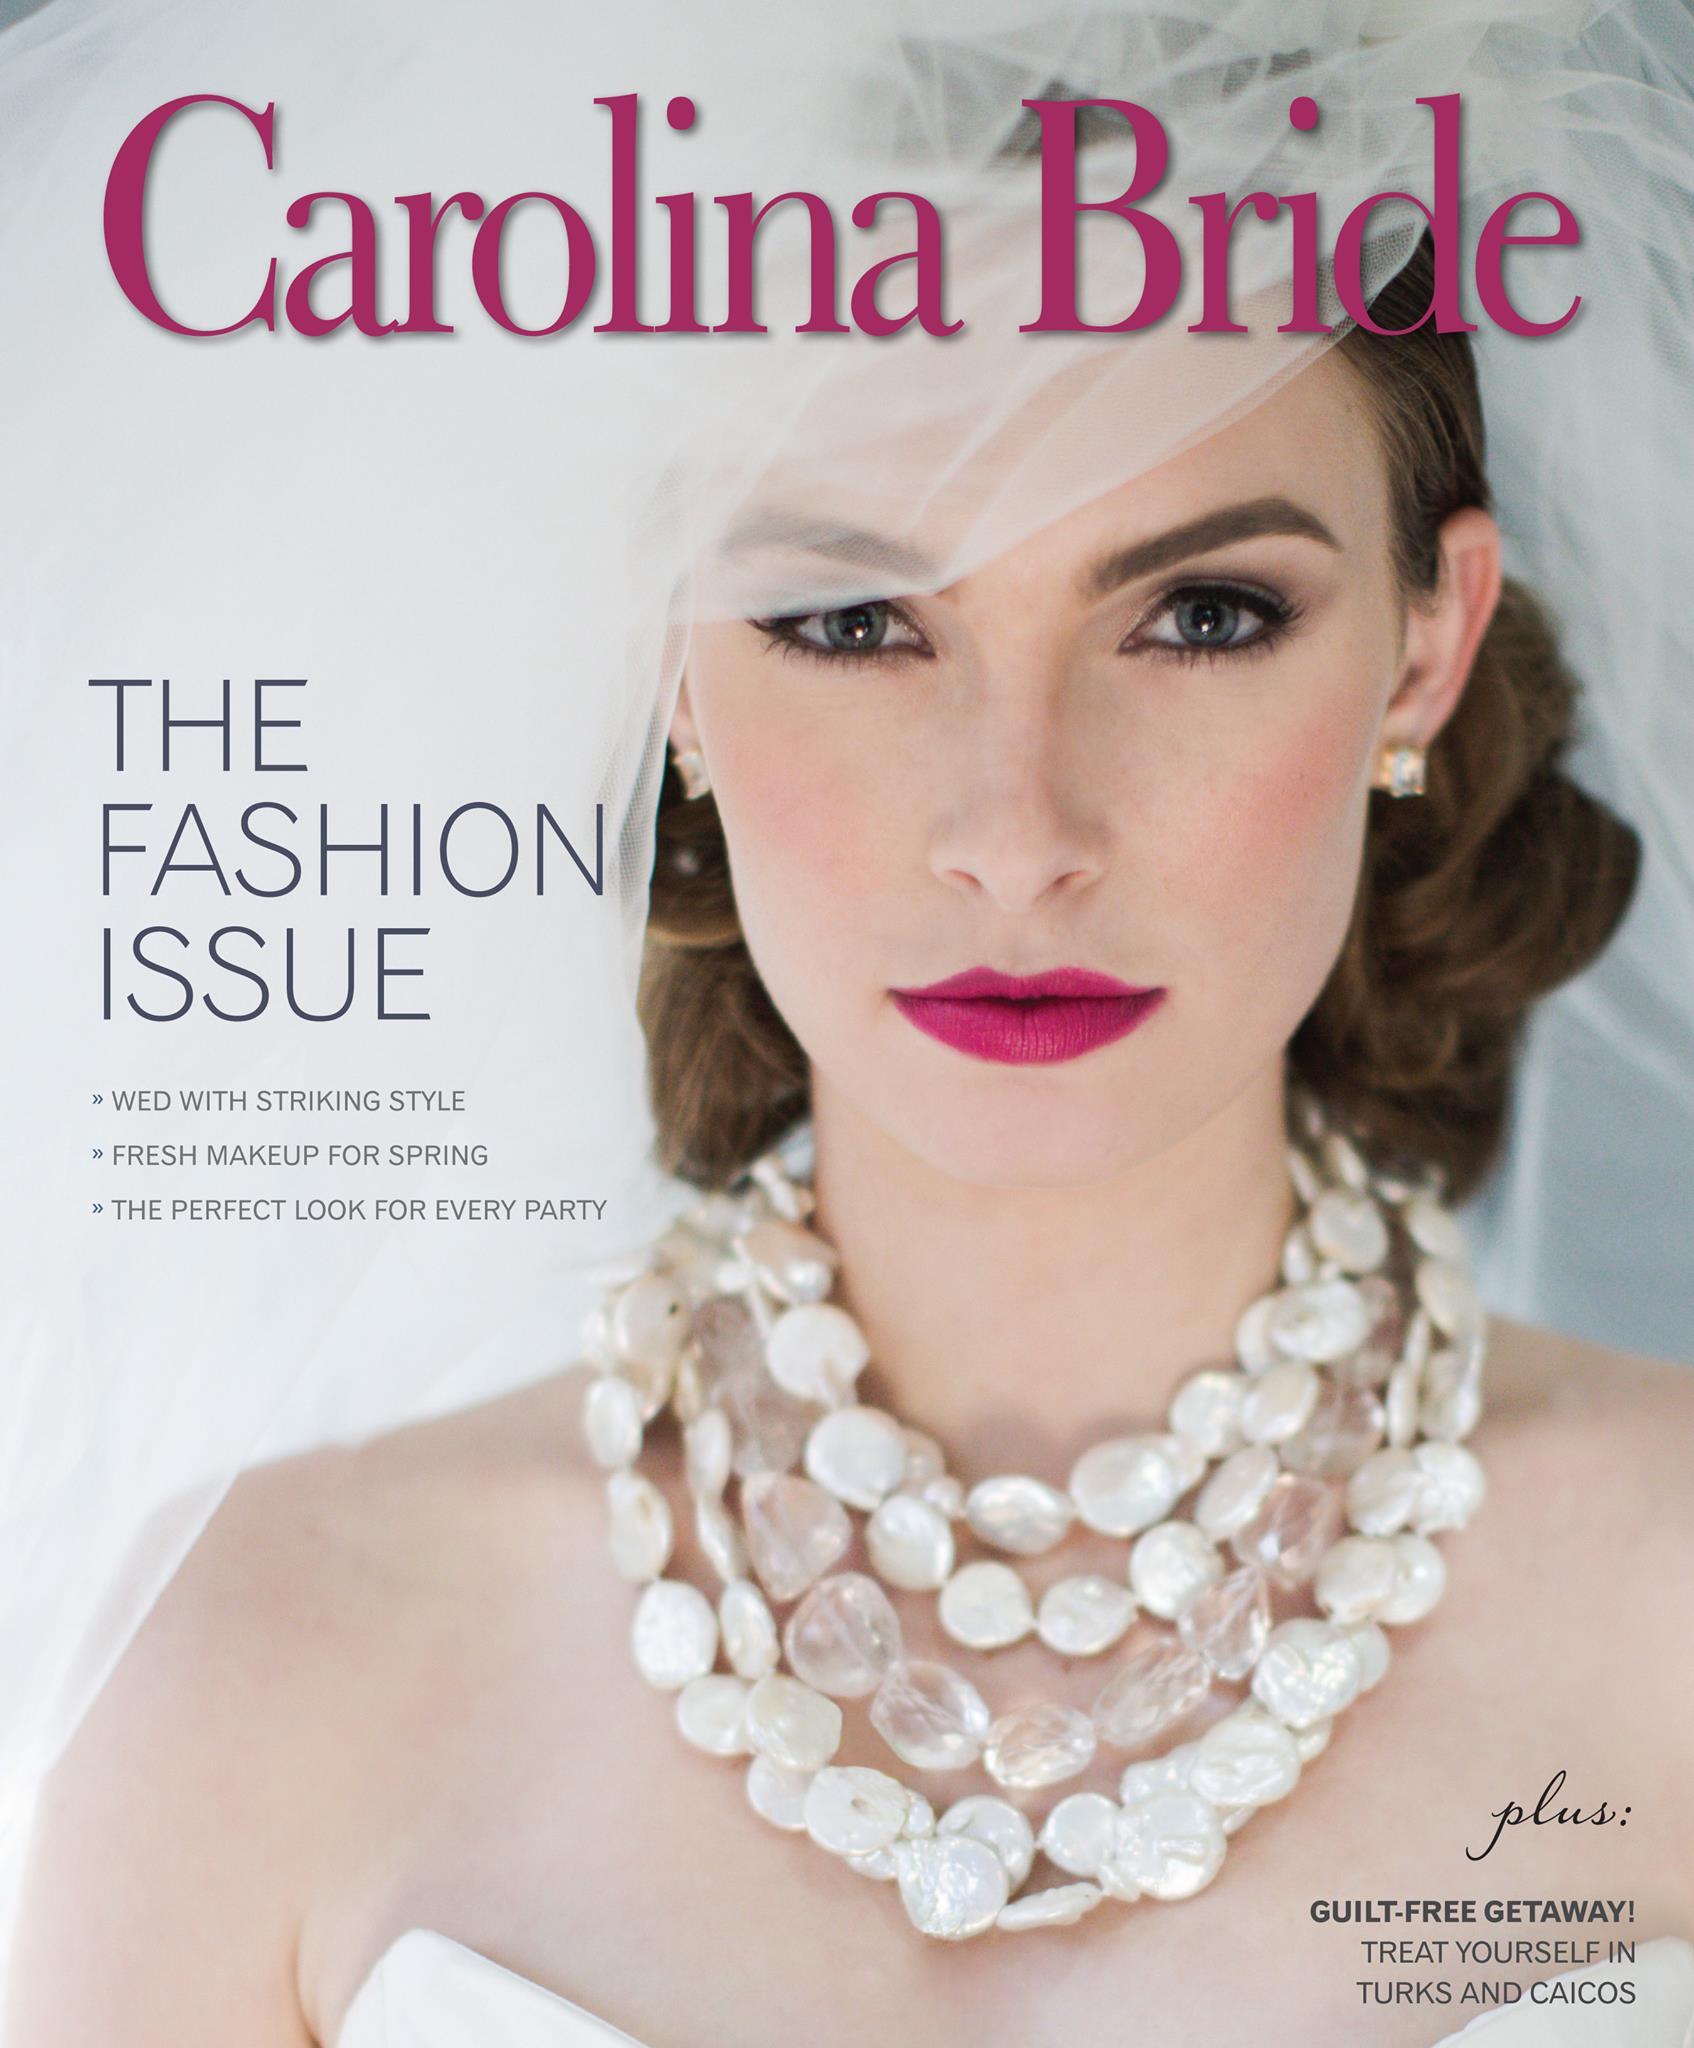 Carolina Bride: The Fashion Issue -